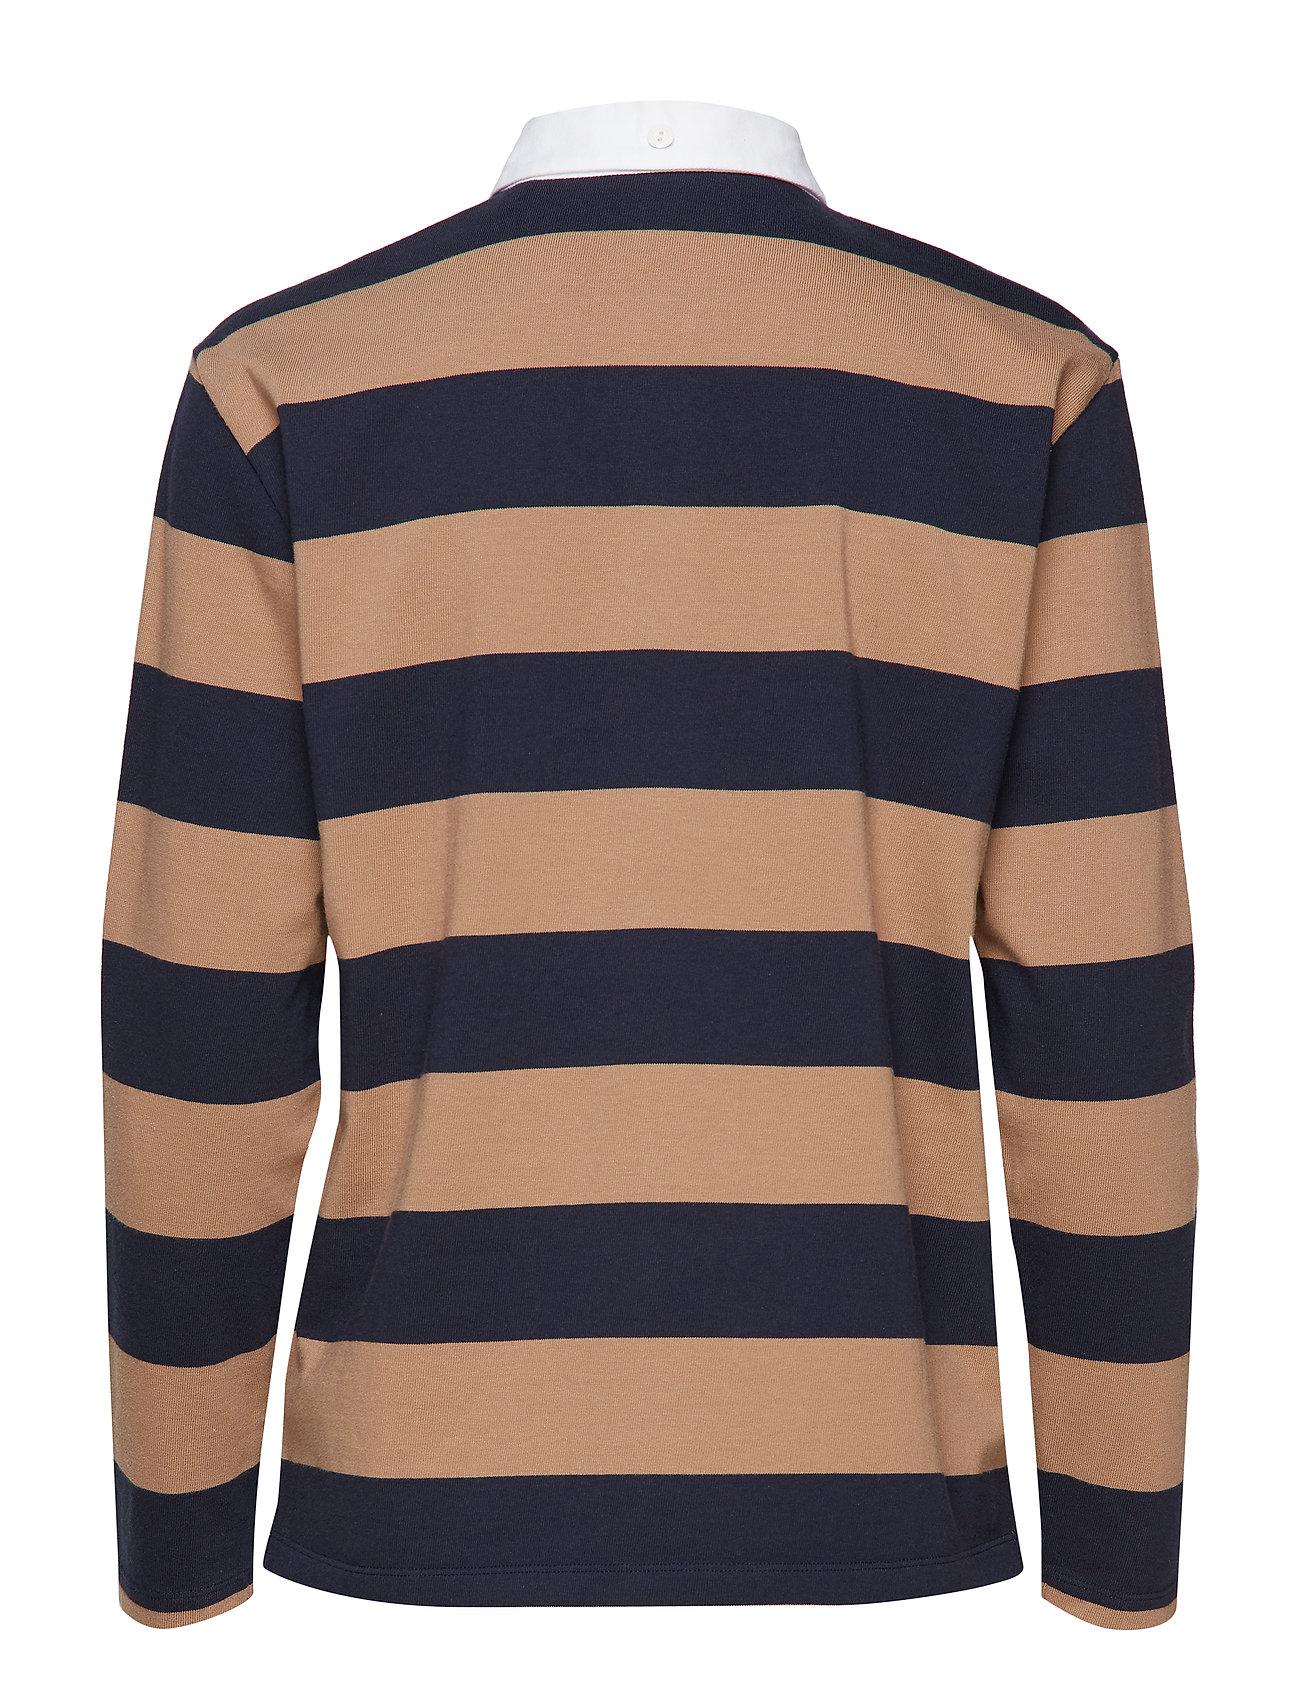 O1Heavy Rugger Ls Stripedwarm Ls KhakiGant Rugger O1Heavy Stripedwarm j354ARLq